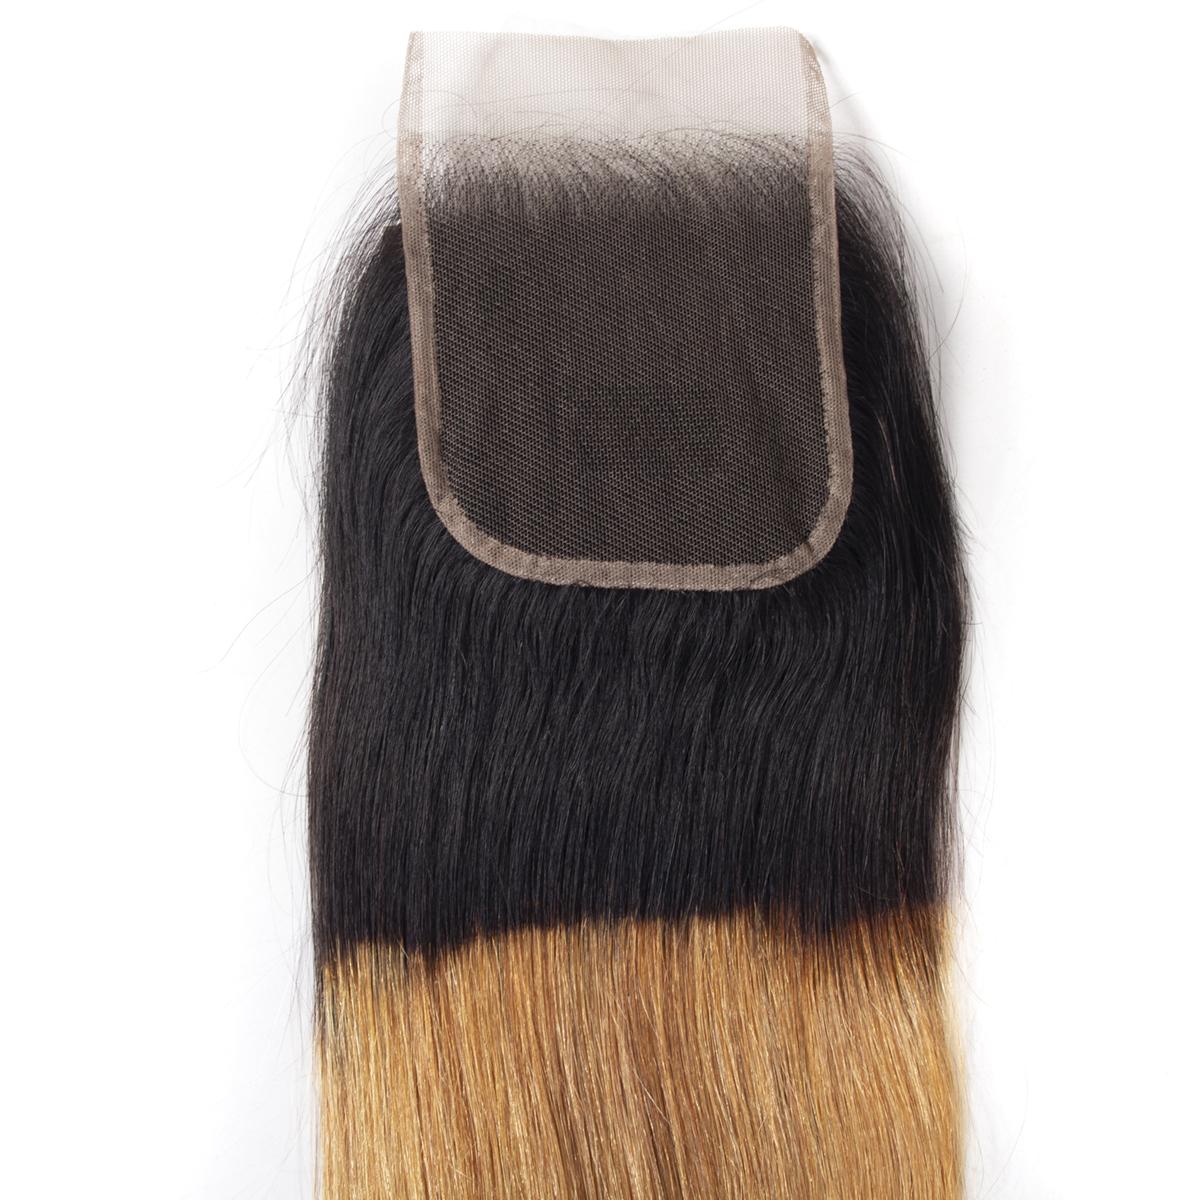 1B 27 straight hair lace closure 1